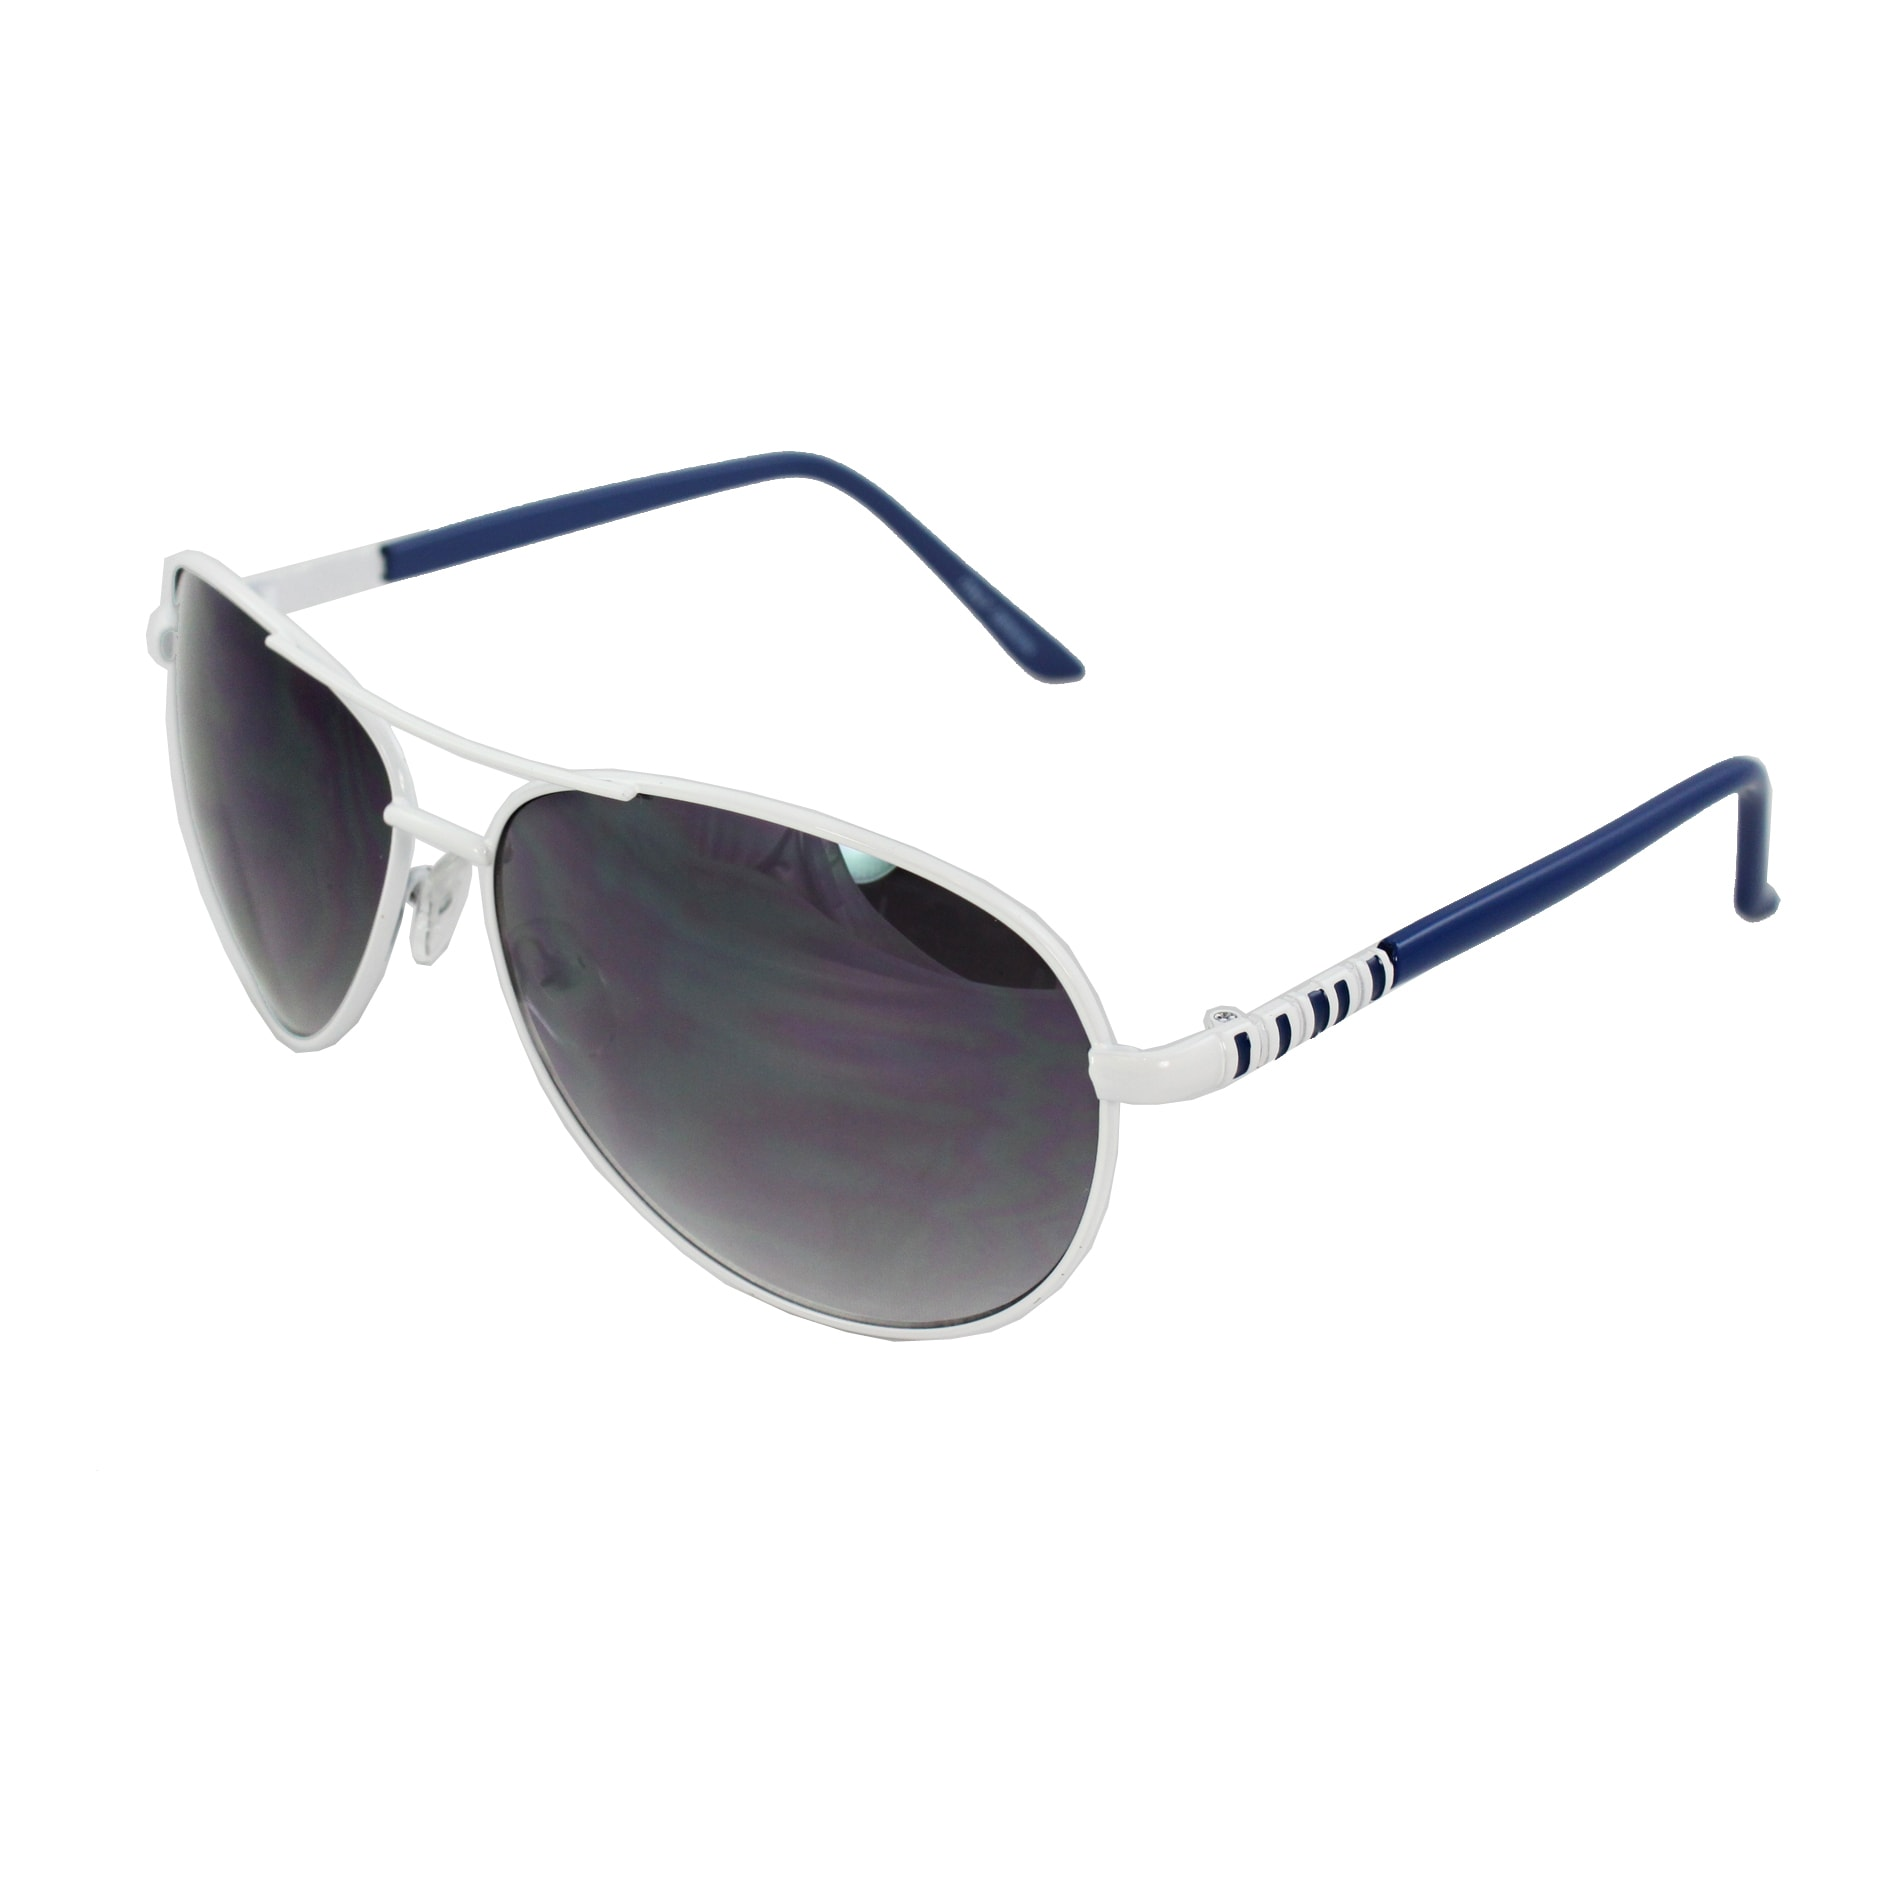 Pilot Fashion Aviator Sunglasses White and Blue Frame Purple Black Lenses for Men and Women